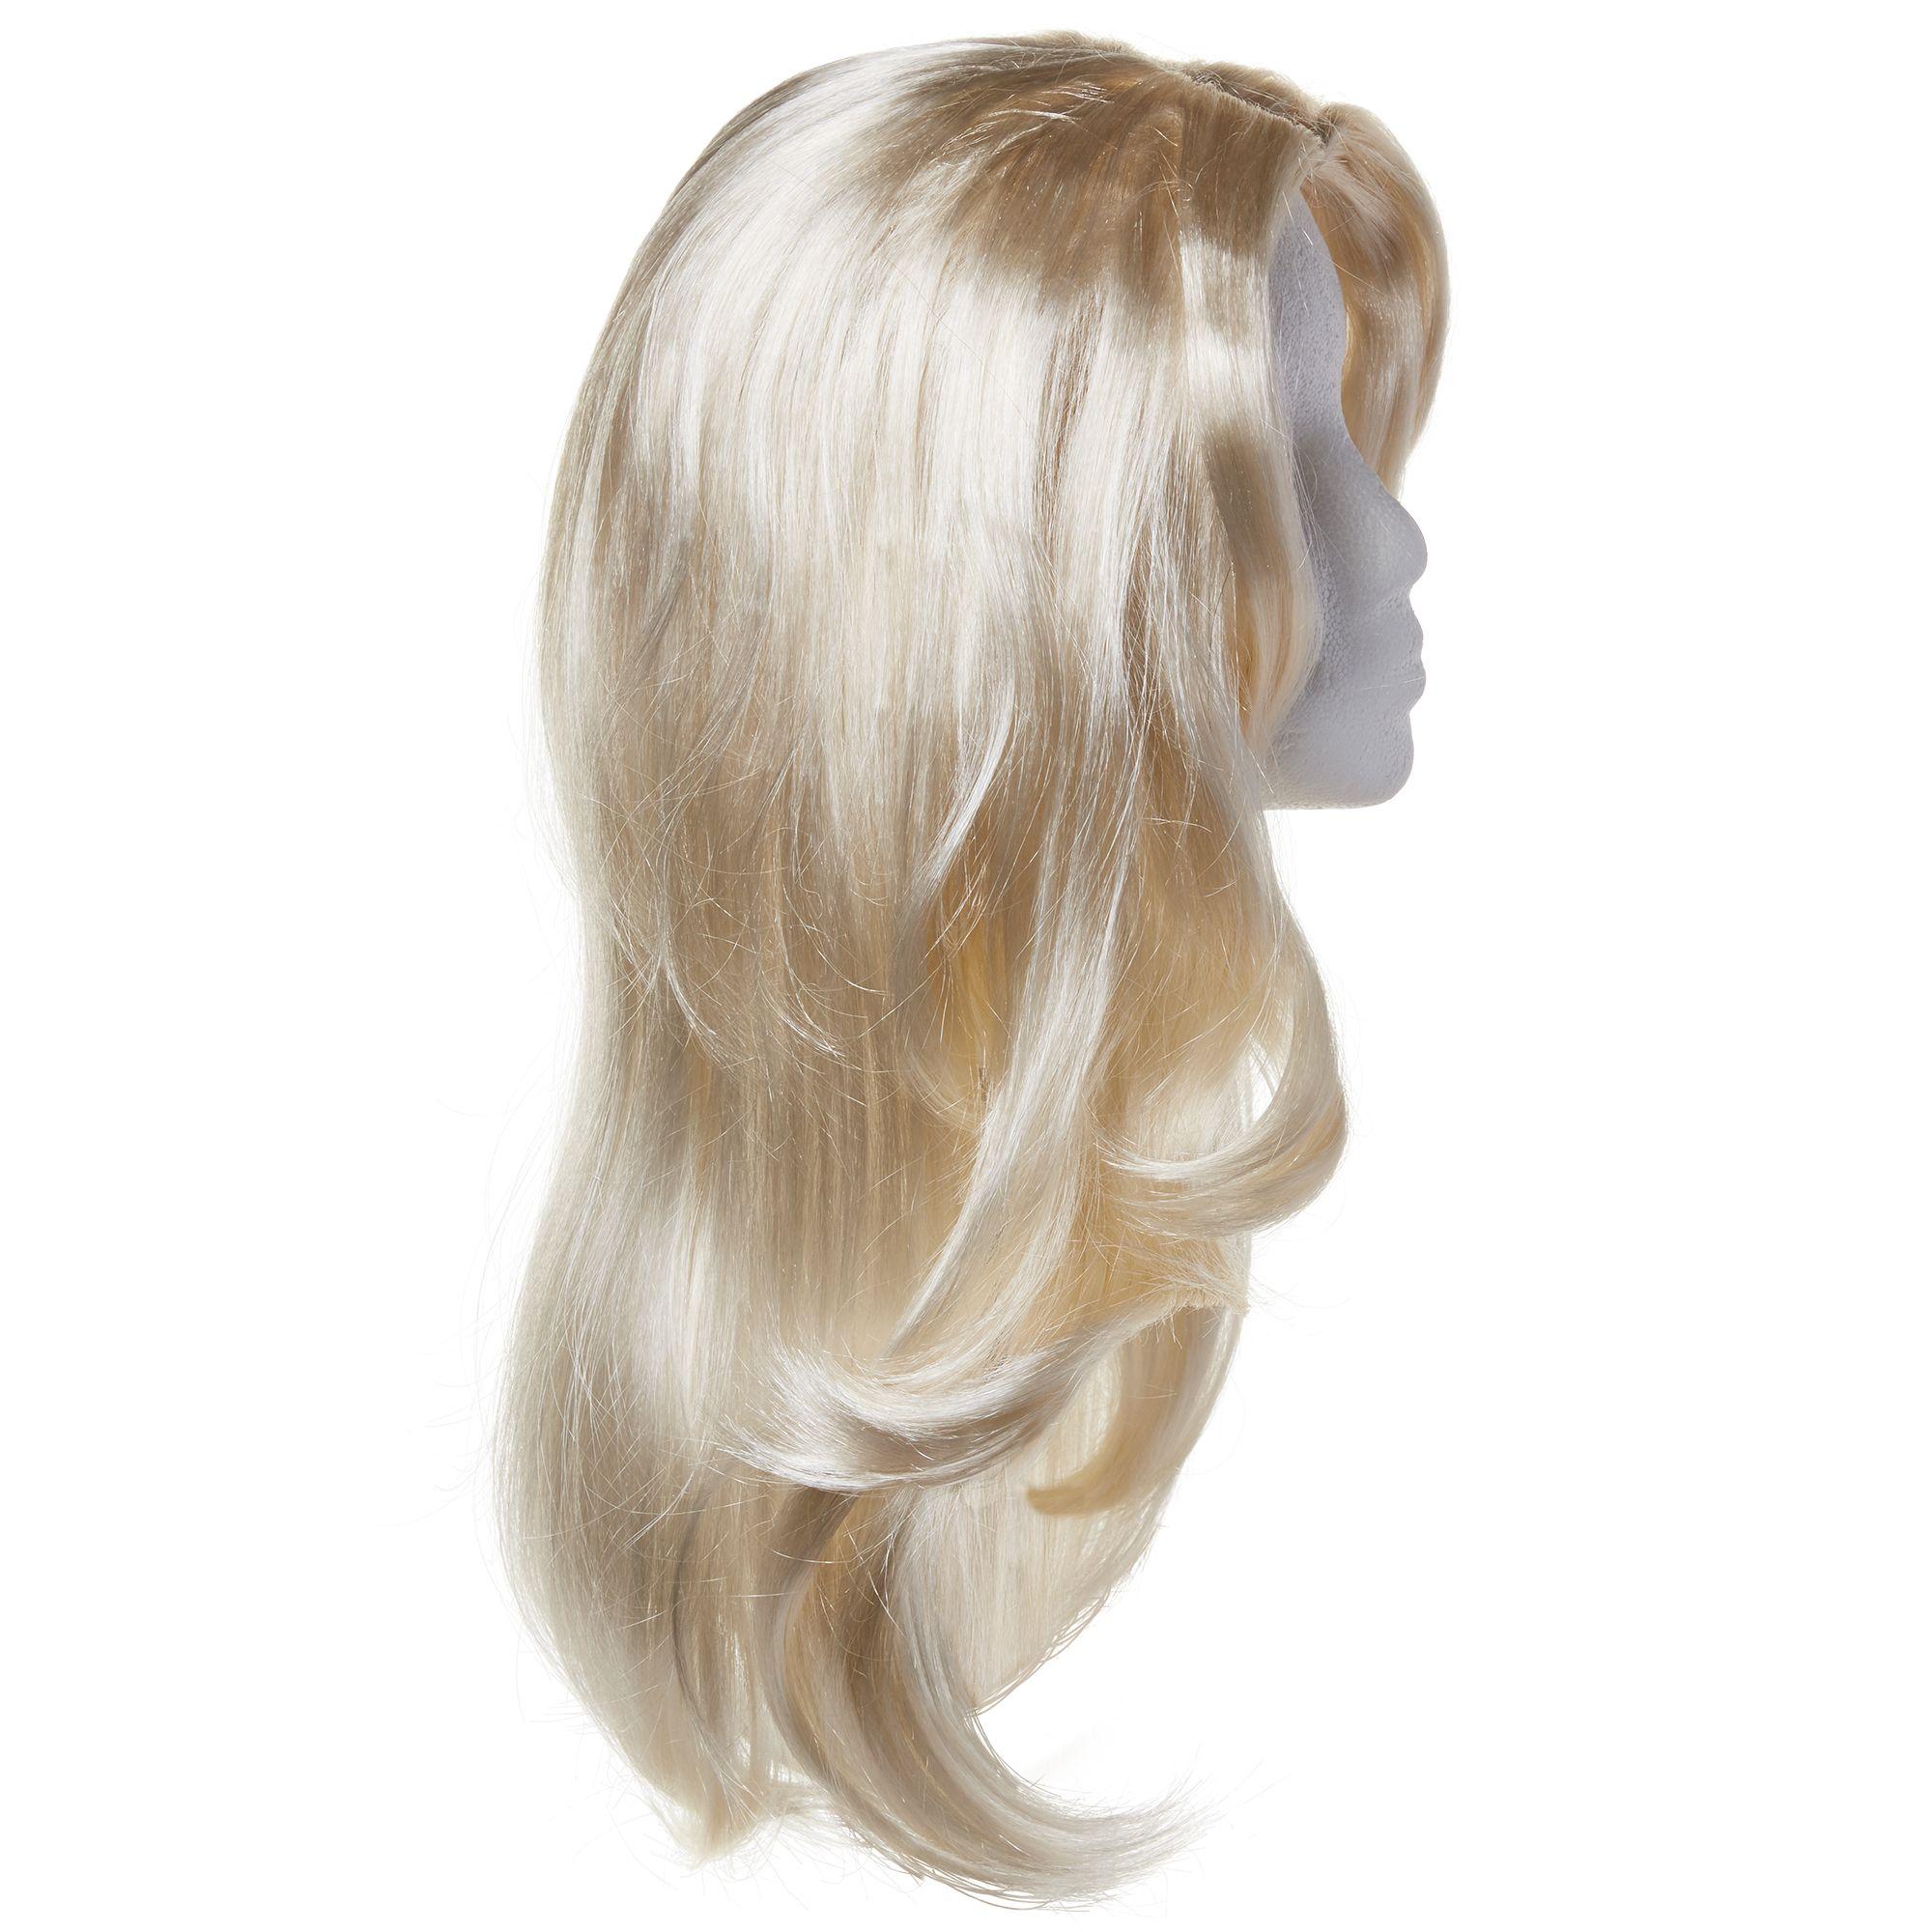 Elsa Epilogue Wig In 2020 Disney Frozen Elsa Wig Long Hair Styles